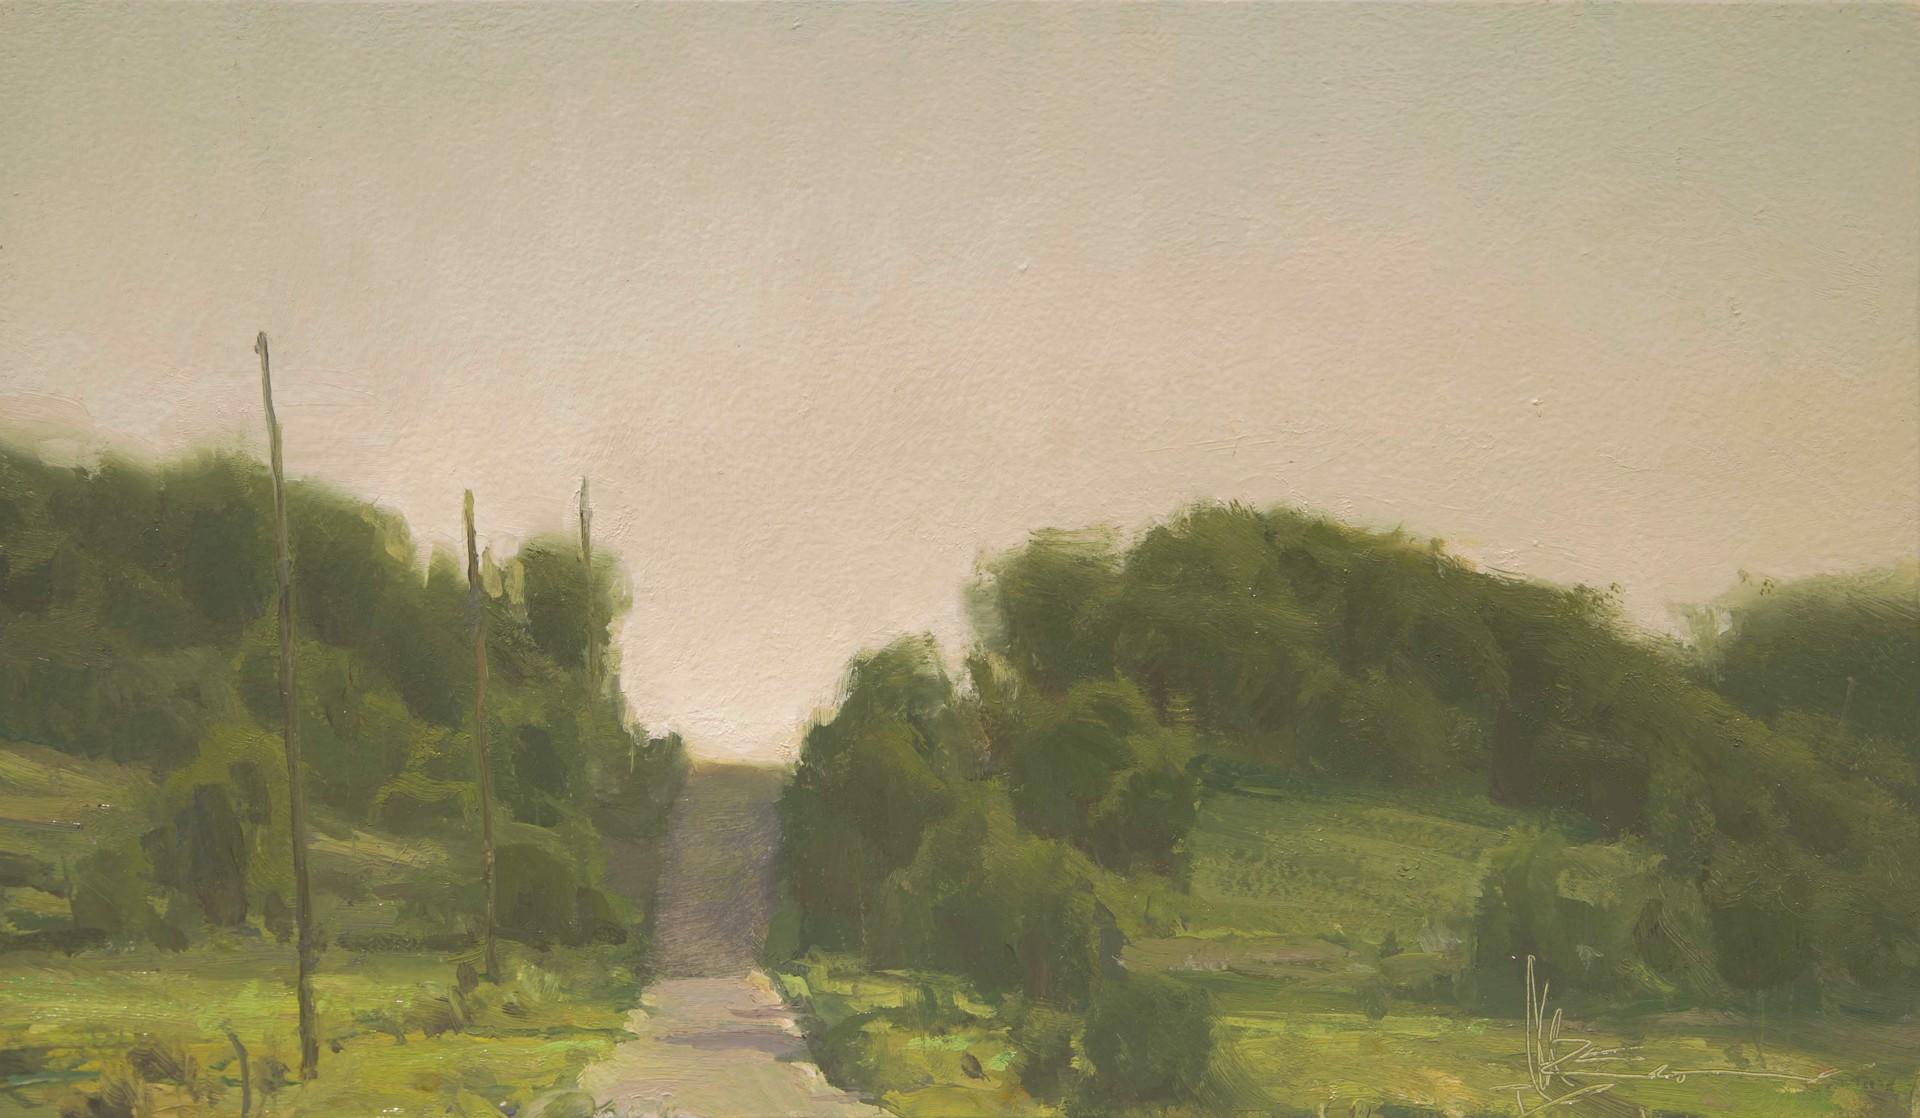 Back Roads by Josh Clare